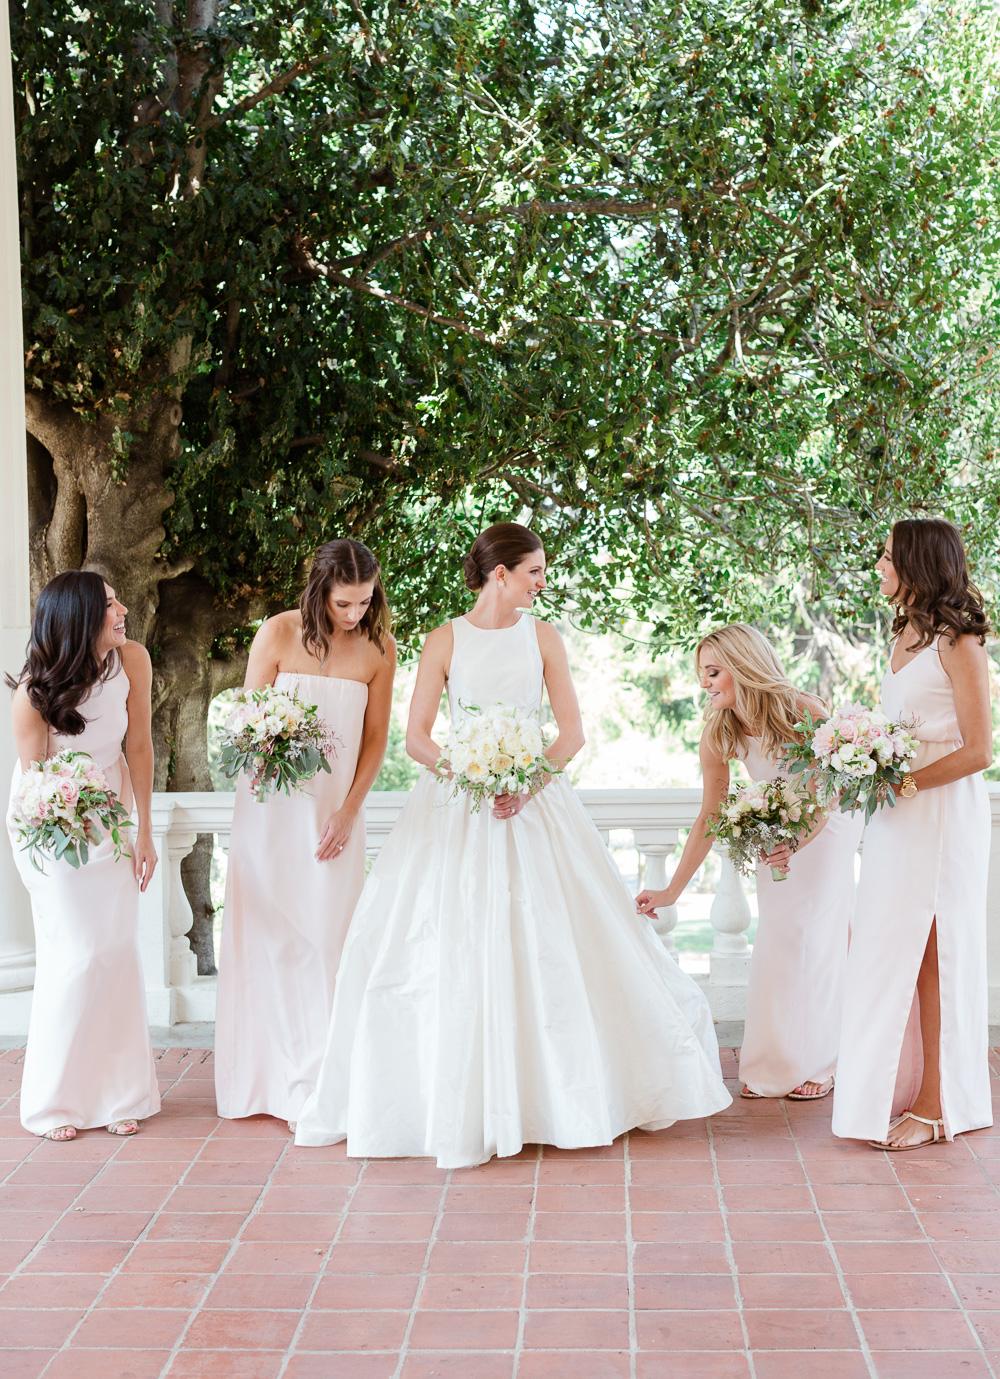 thedejaureguis-Villa-Montalvo-wedding-024.jpg